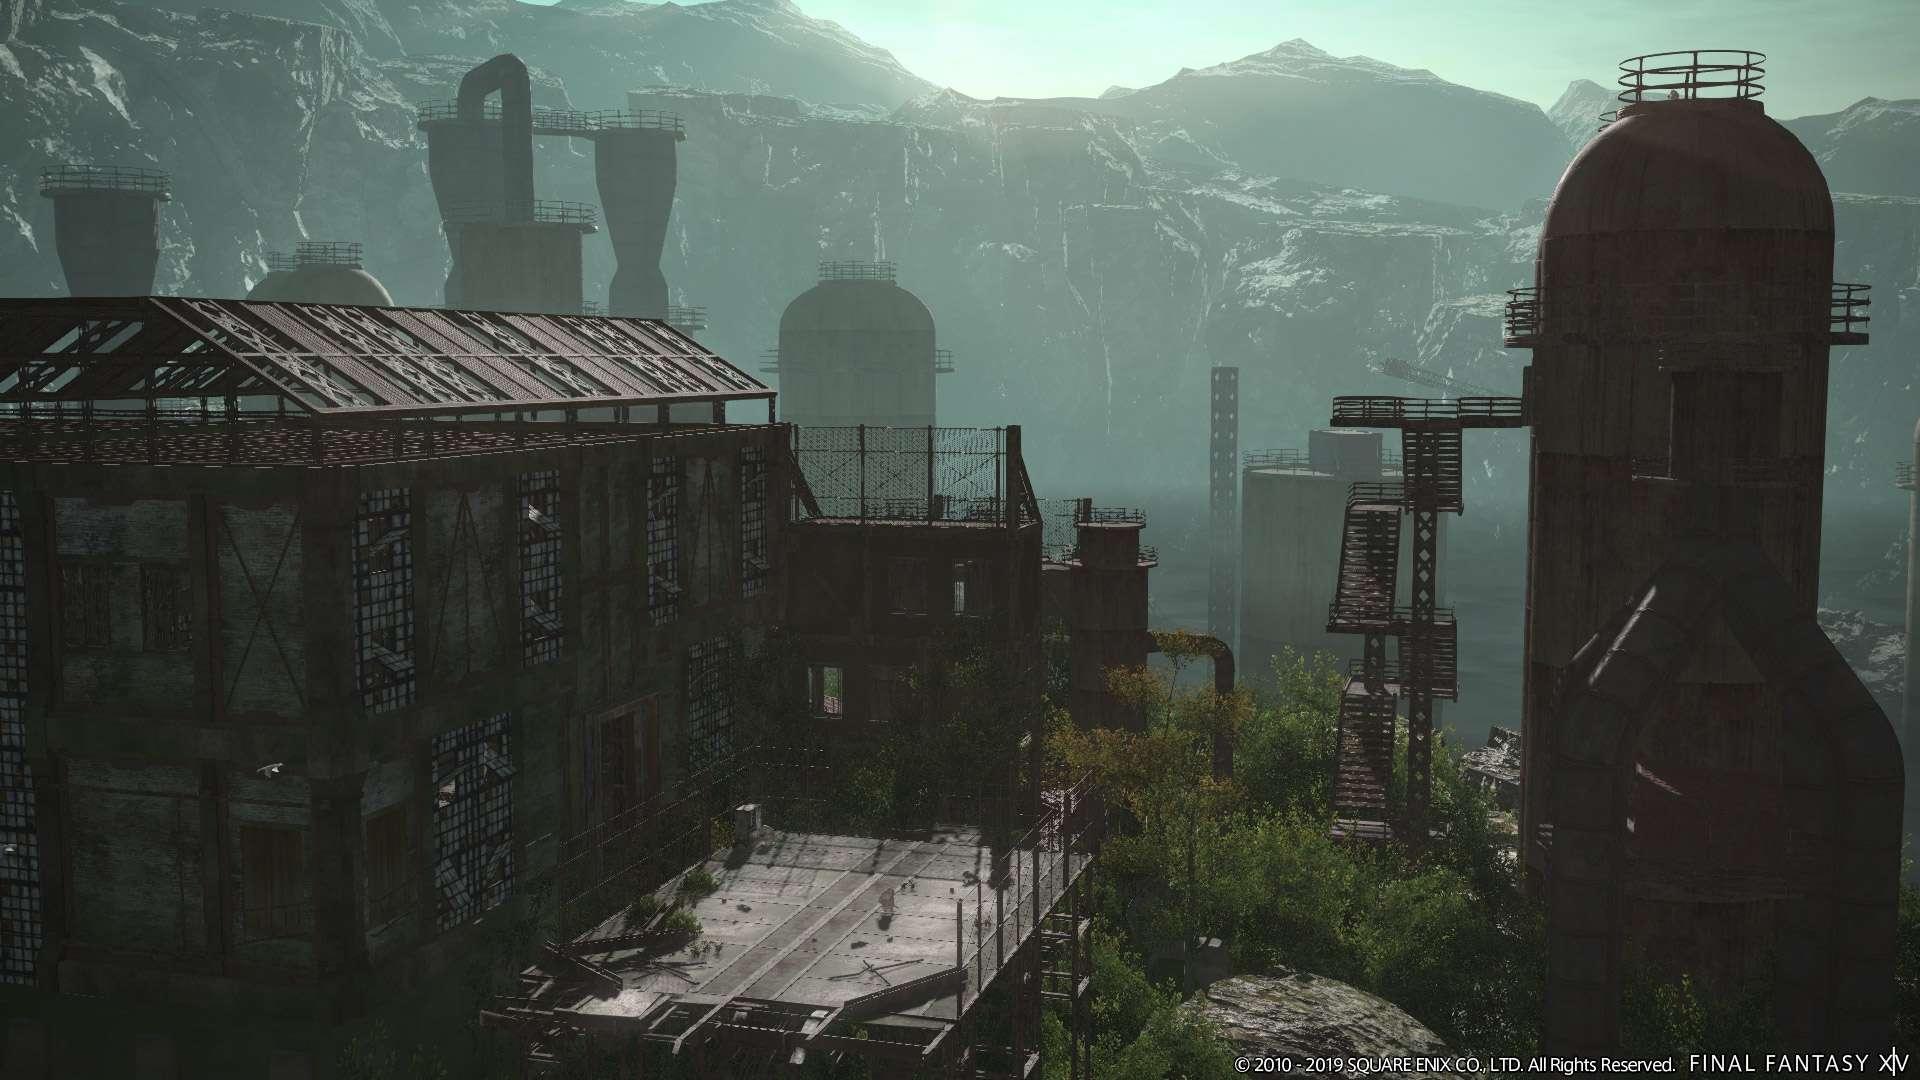 Final Fantasy XIV - The Copied Factory